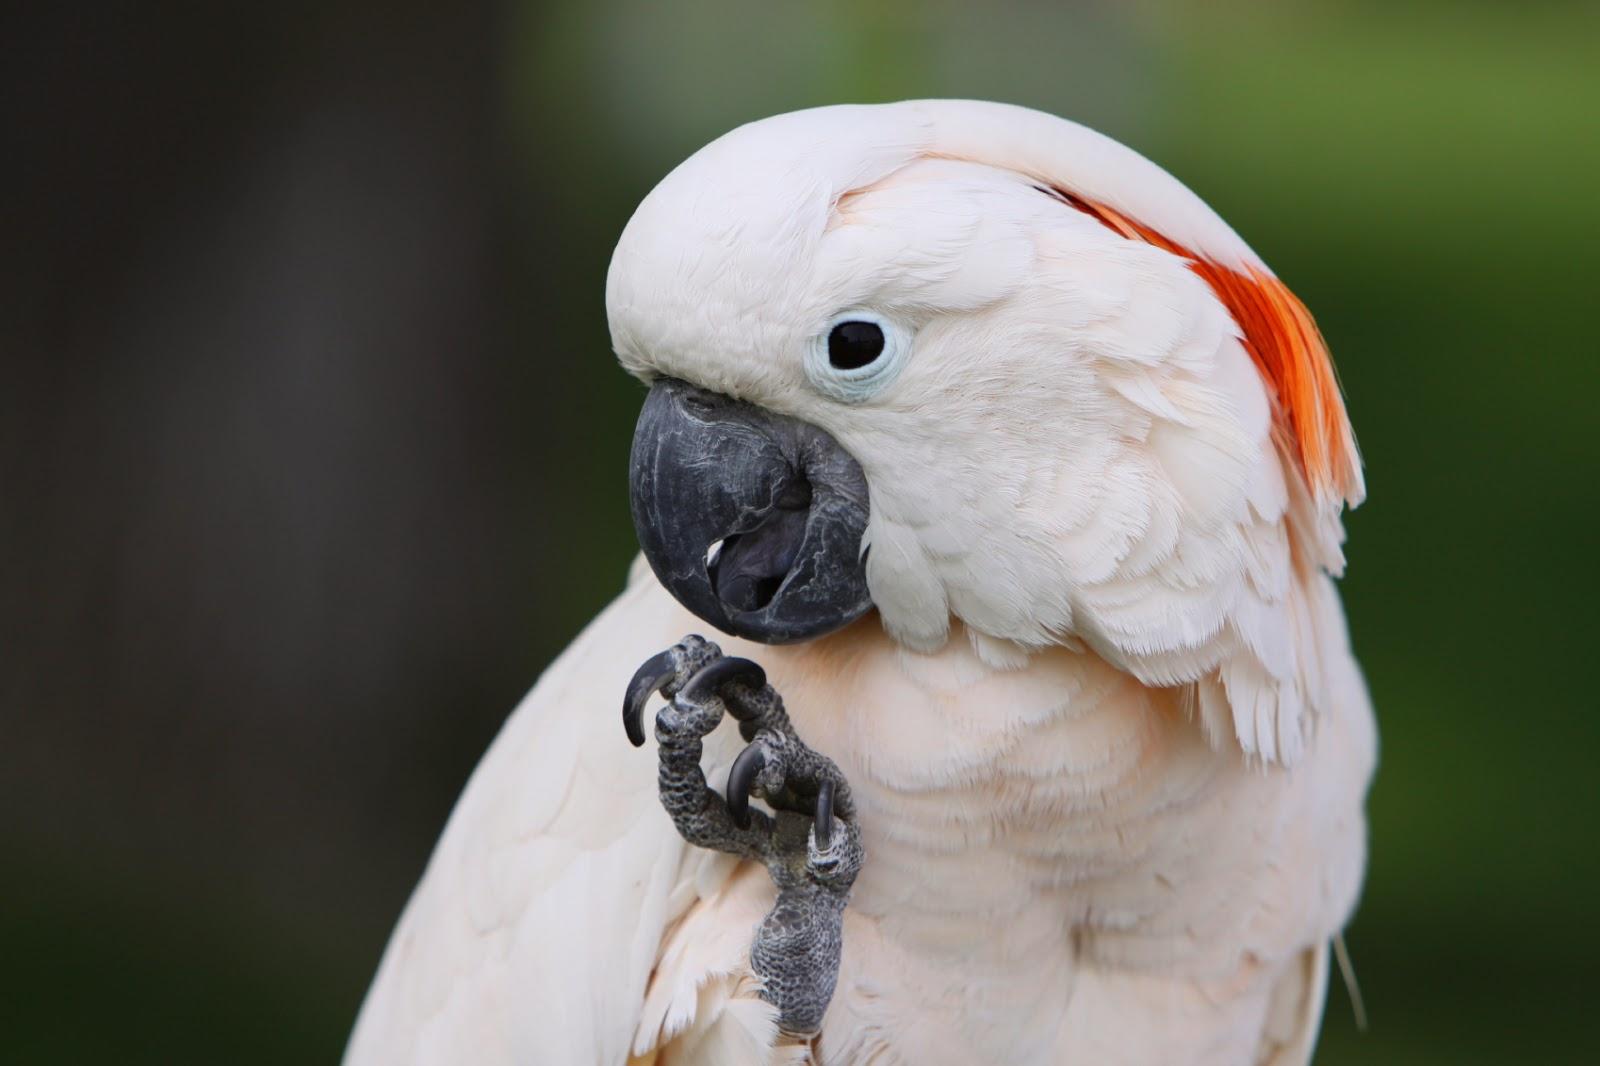 burung kakatua seram (Cacatua moluccensis) dilindungi undang undang